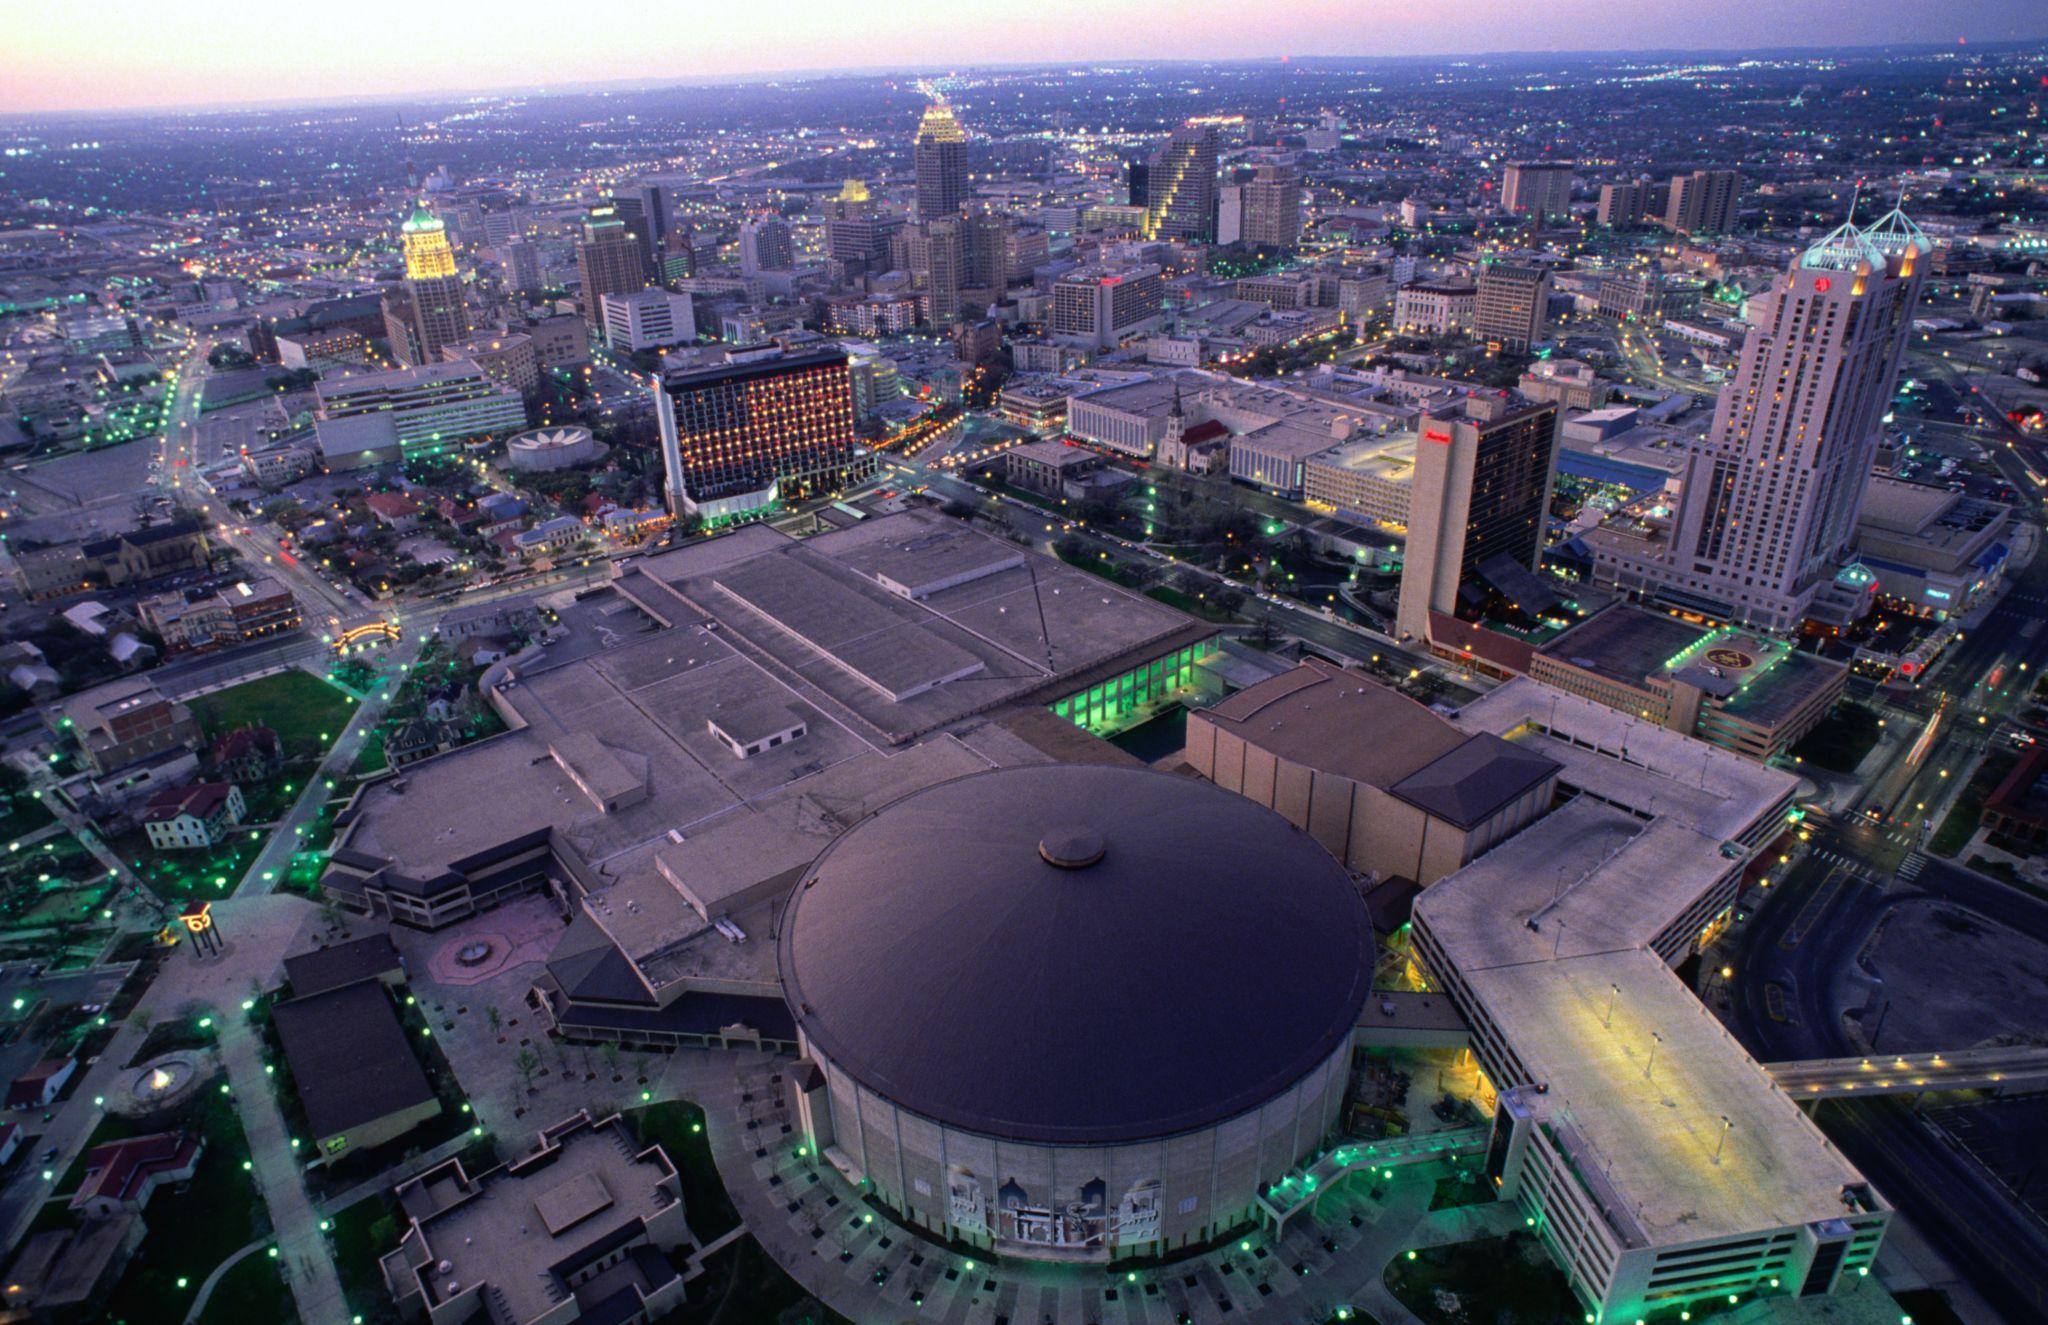 Data shows San Antonio's population boom in 2020